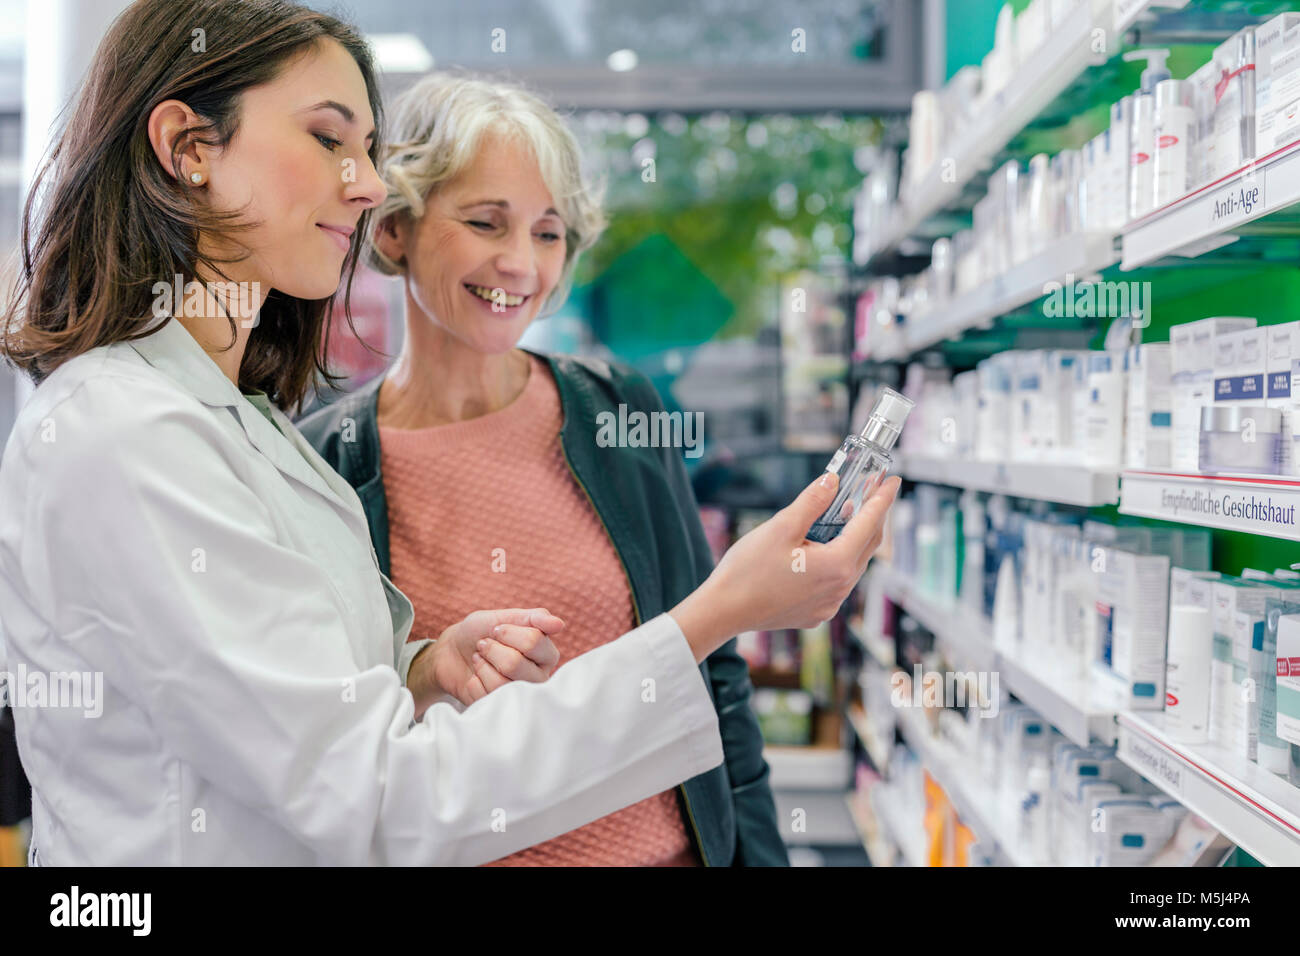 Pharmacist advising customer with cosmetics in pharmacy - Stock Image